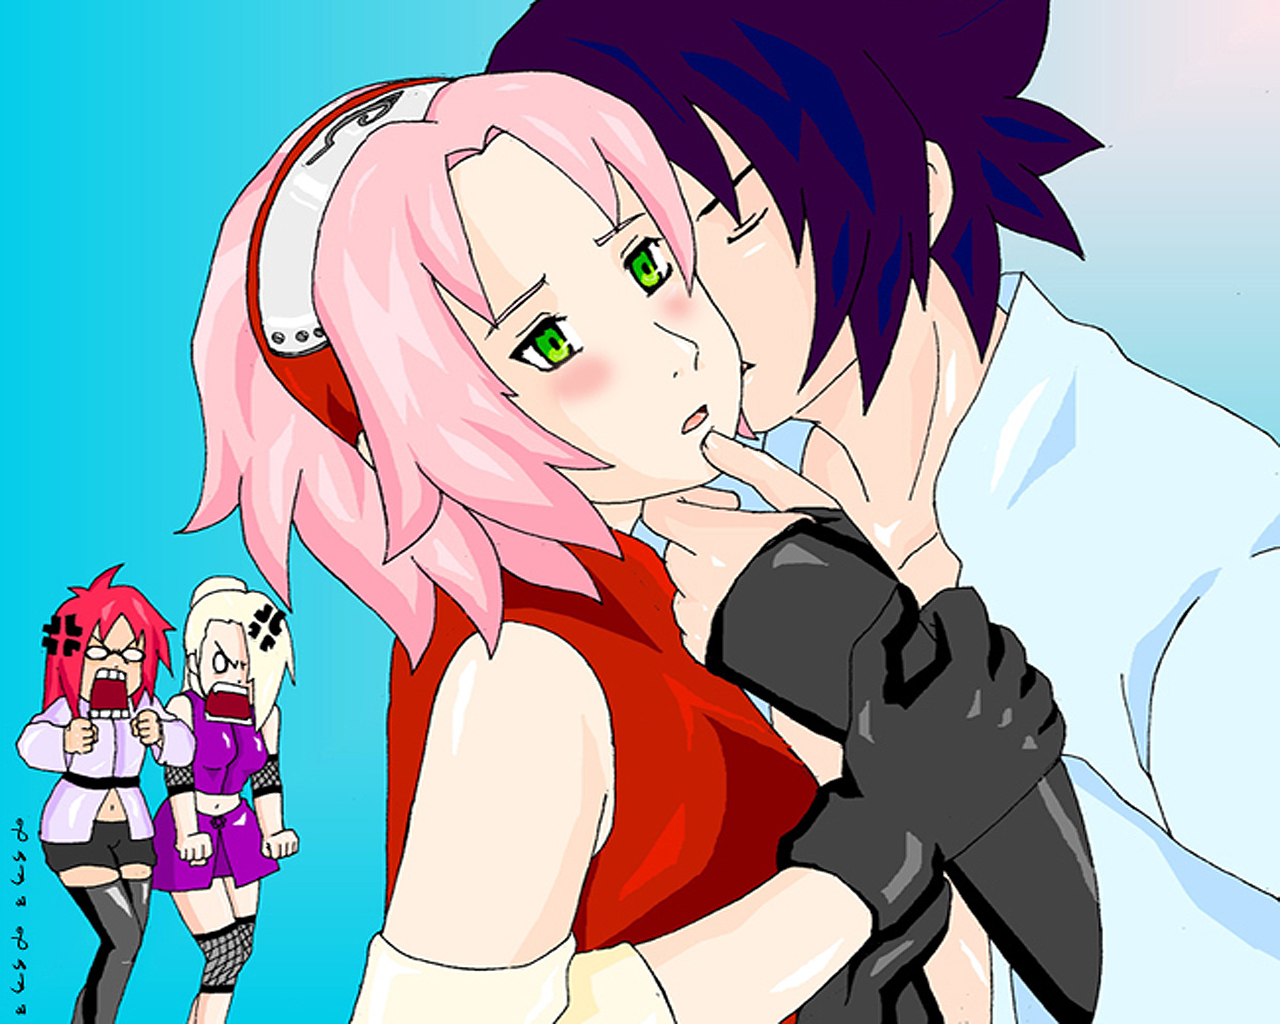 Kiss Sakura Naruto Shippuden Wallpapers on this Naruto ShippudenNaruto Shippuden Naruto And Sakura Kiss